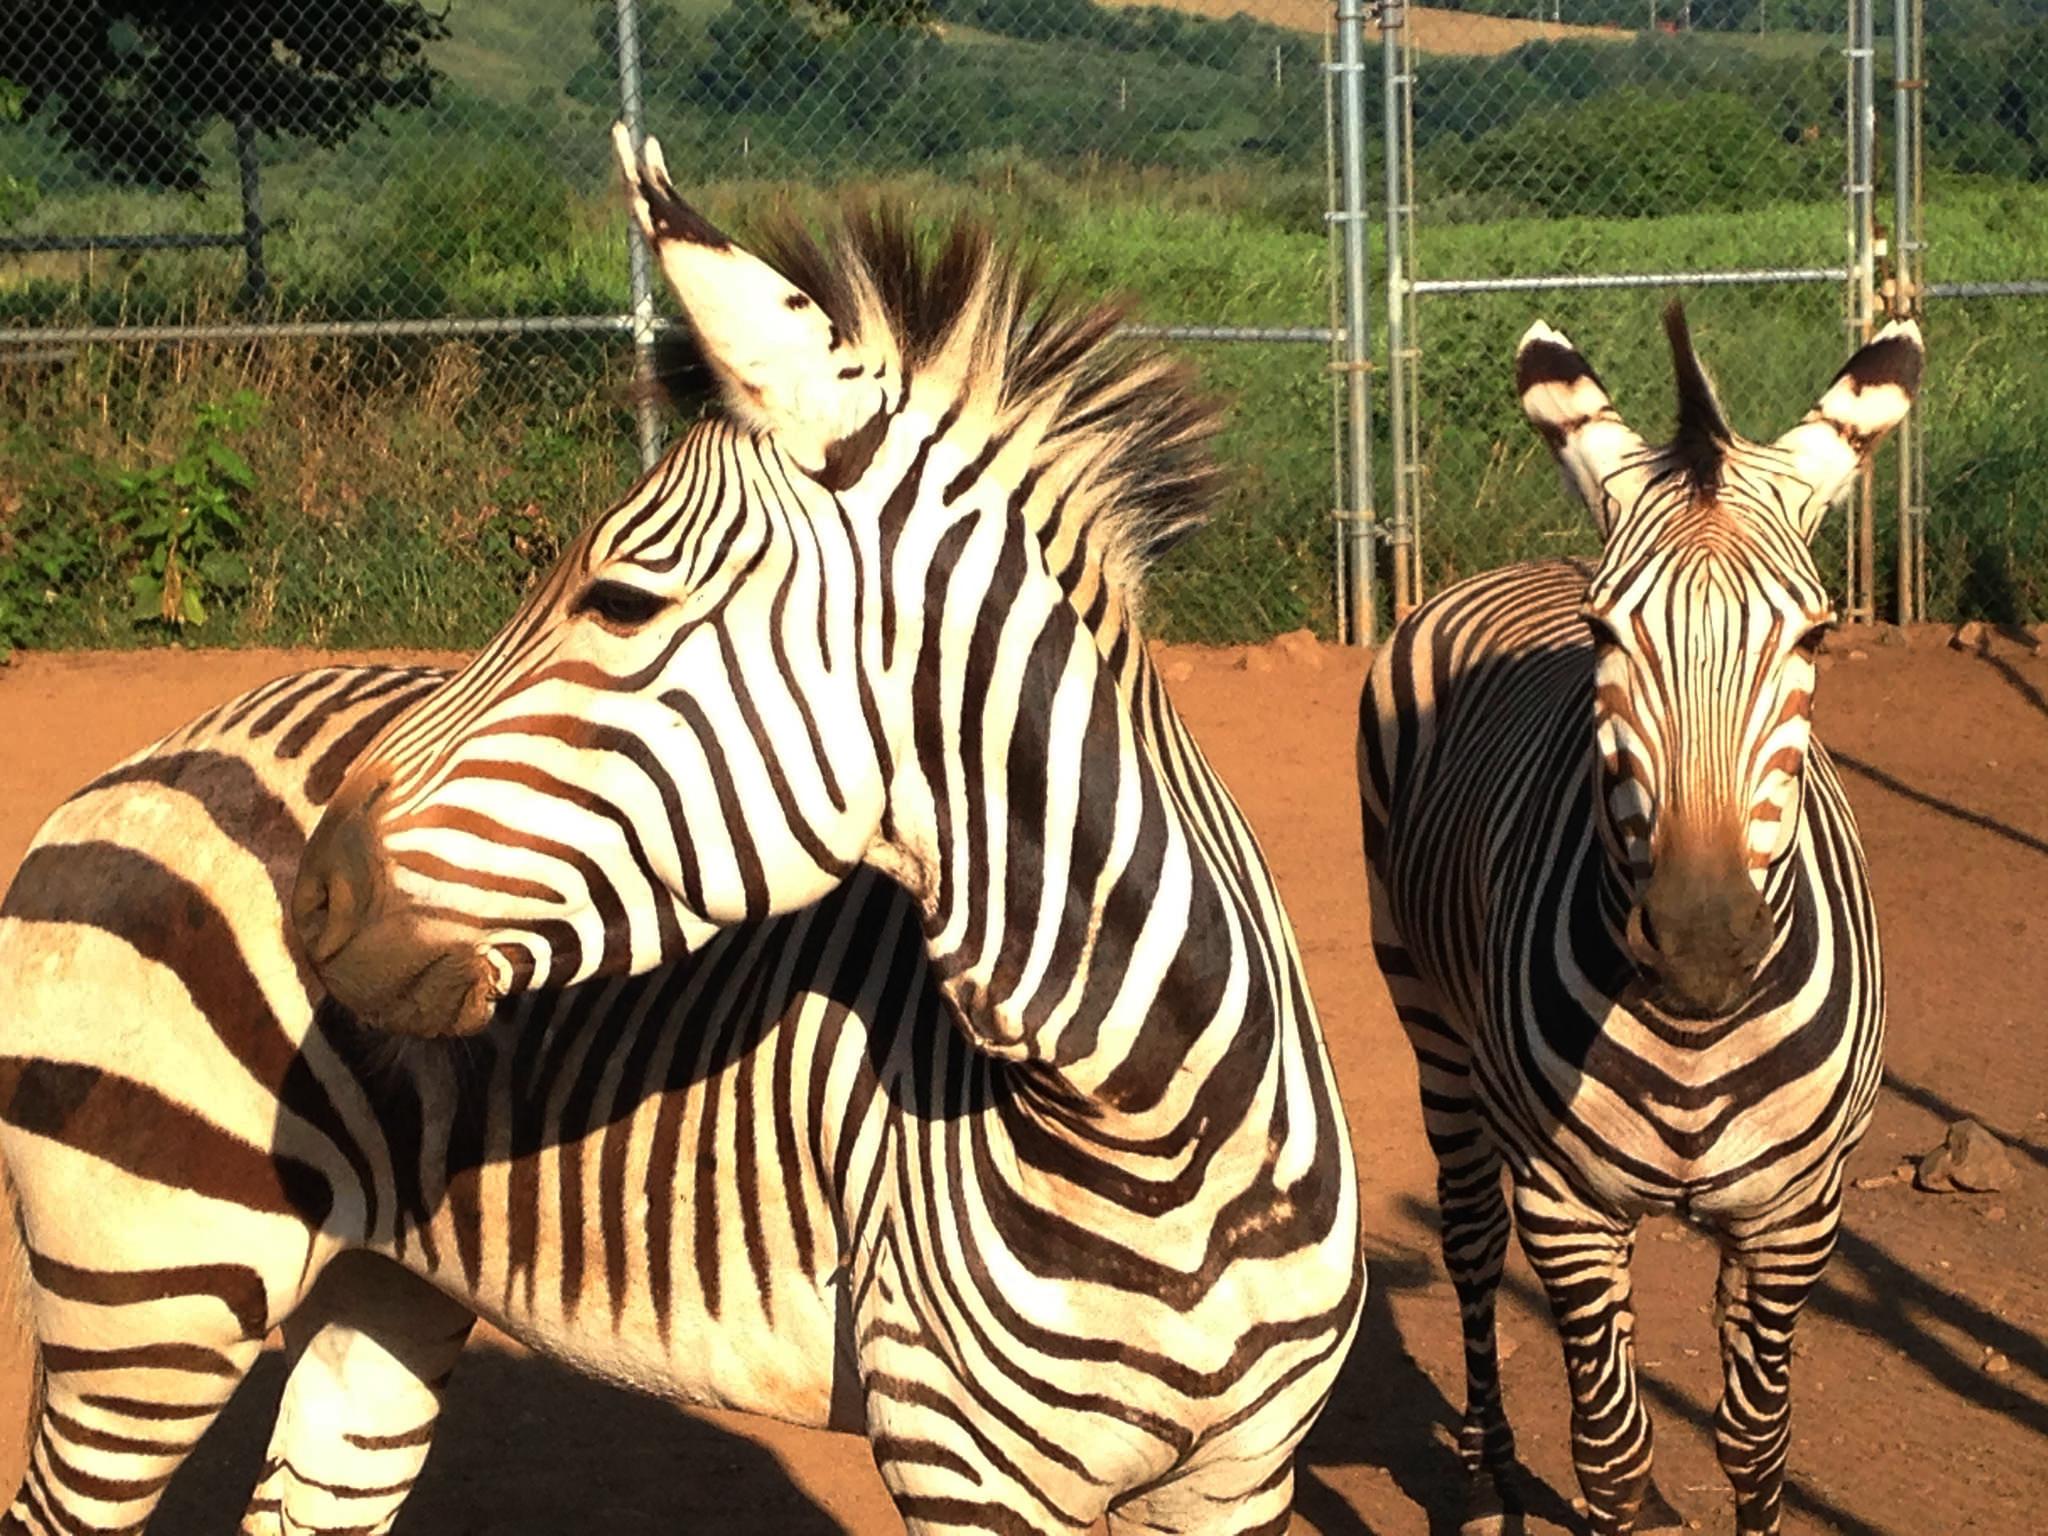 Robust Zebras Lions Rare Zebras Graze At Smithsonian Smithsonian Insider S Zebras Teeth S dpreview Pictures Of Zebras